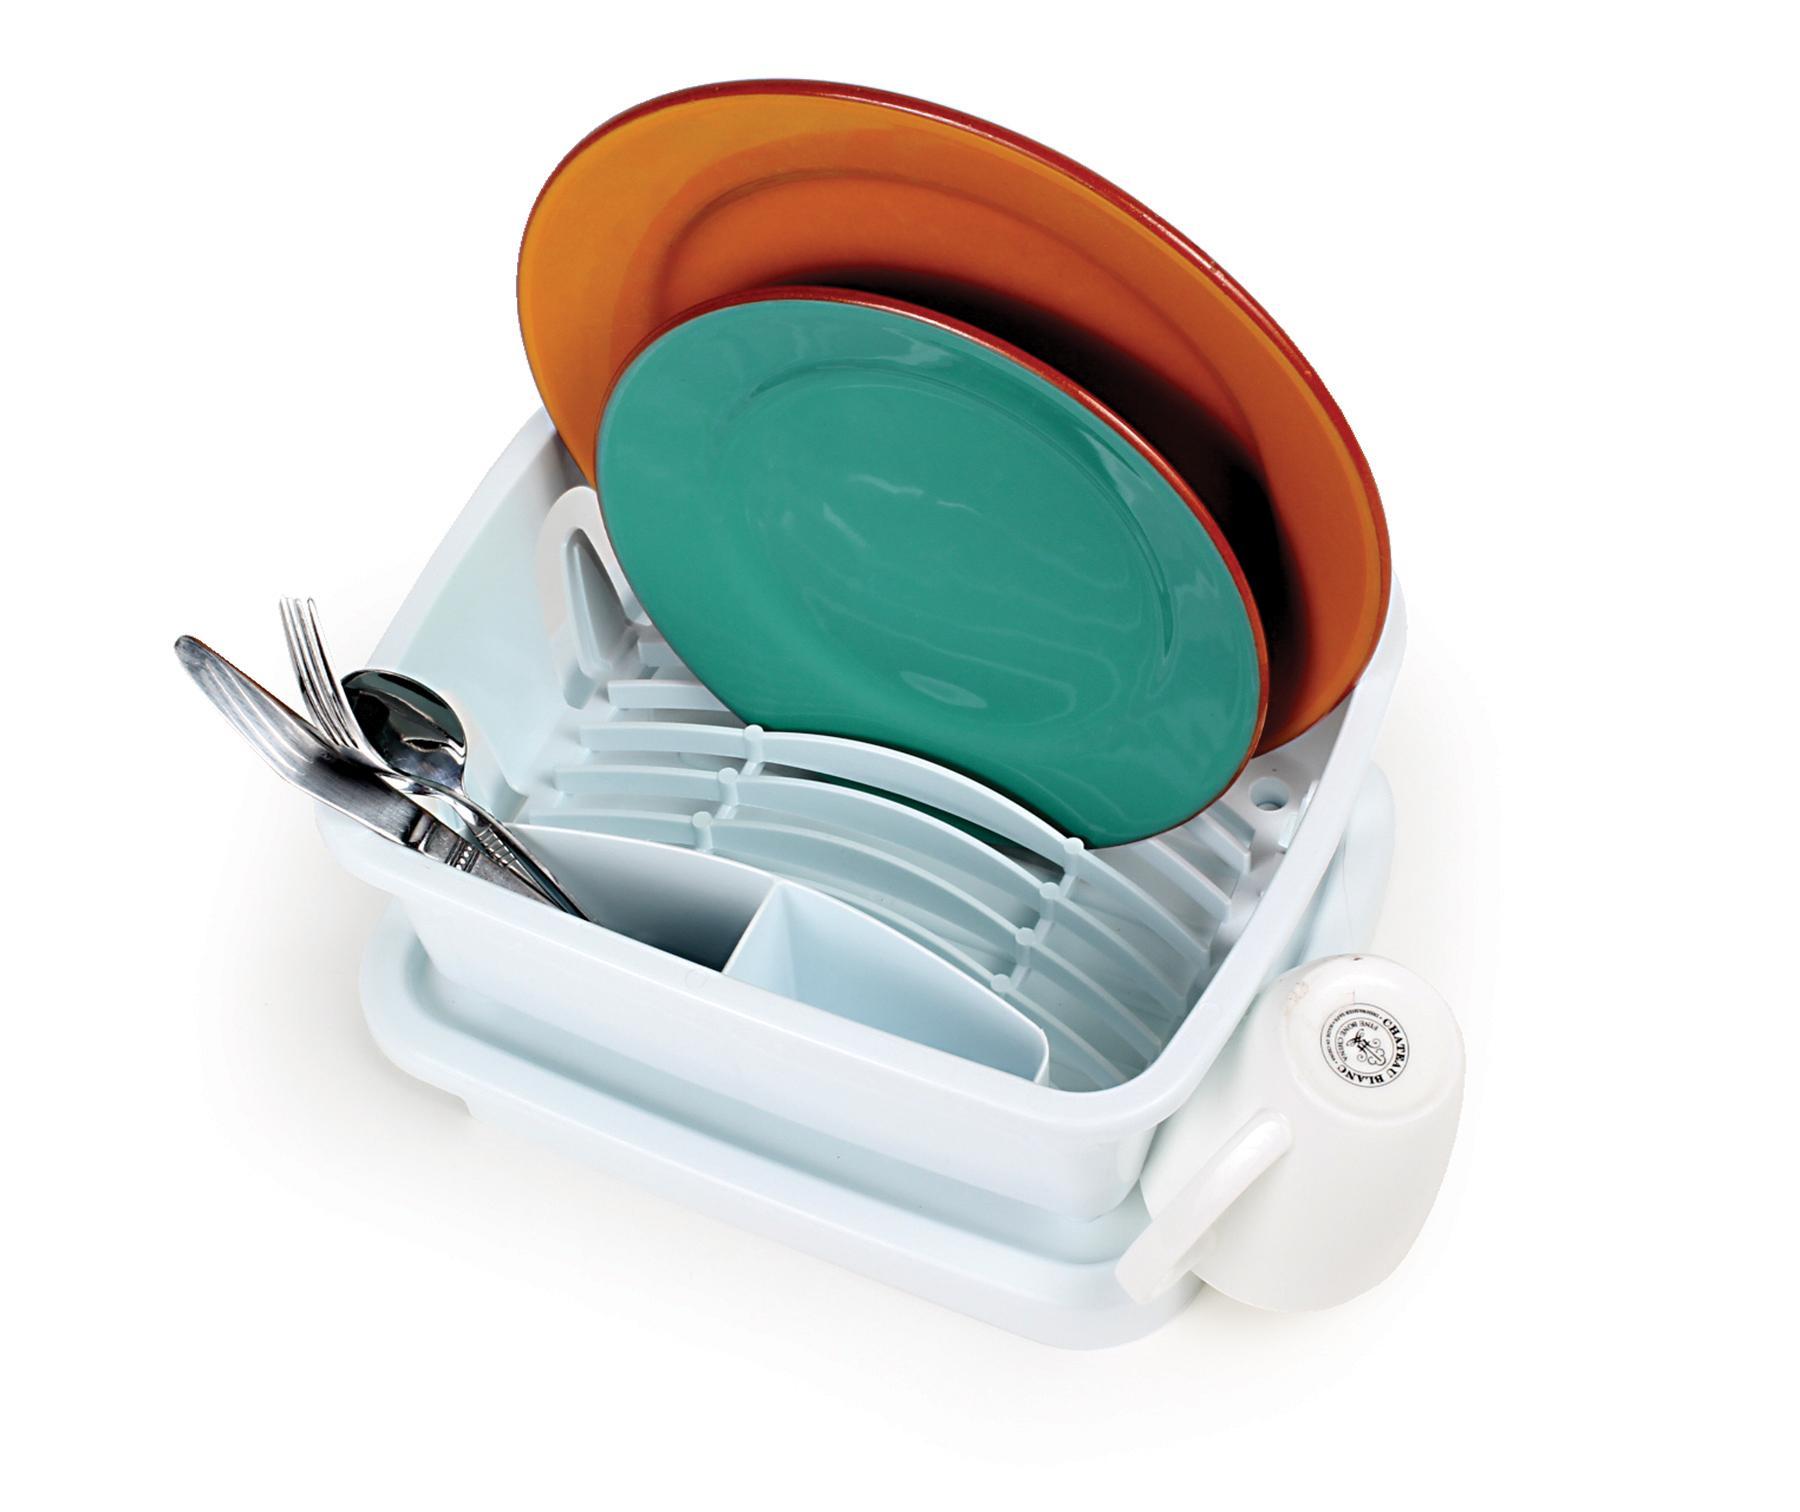 Amazon.com: Camco 43511 Mini Dish Drainer and Tray: Automotive